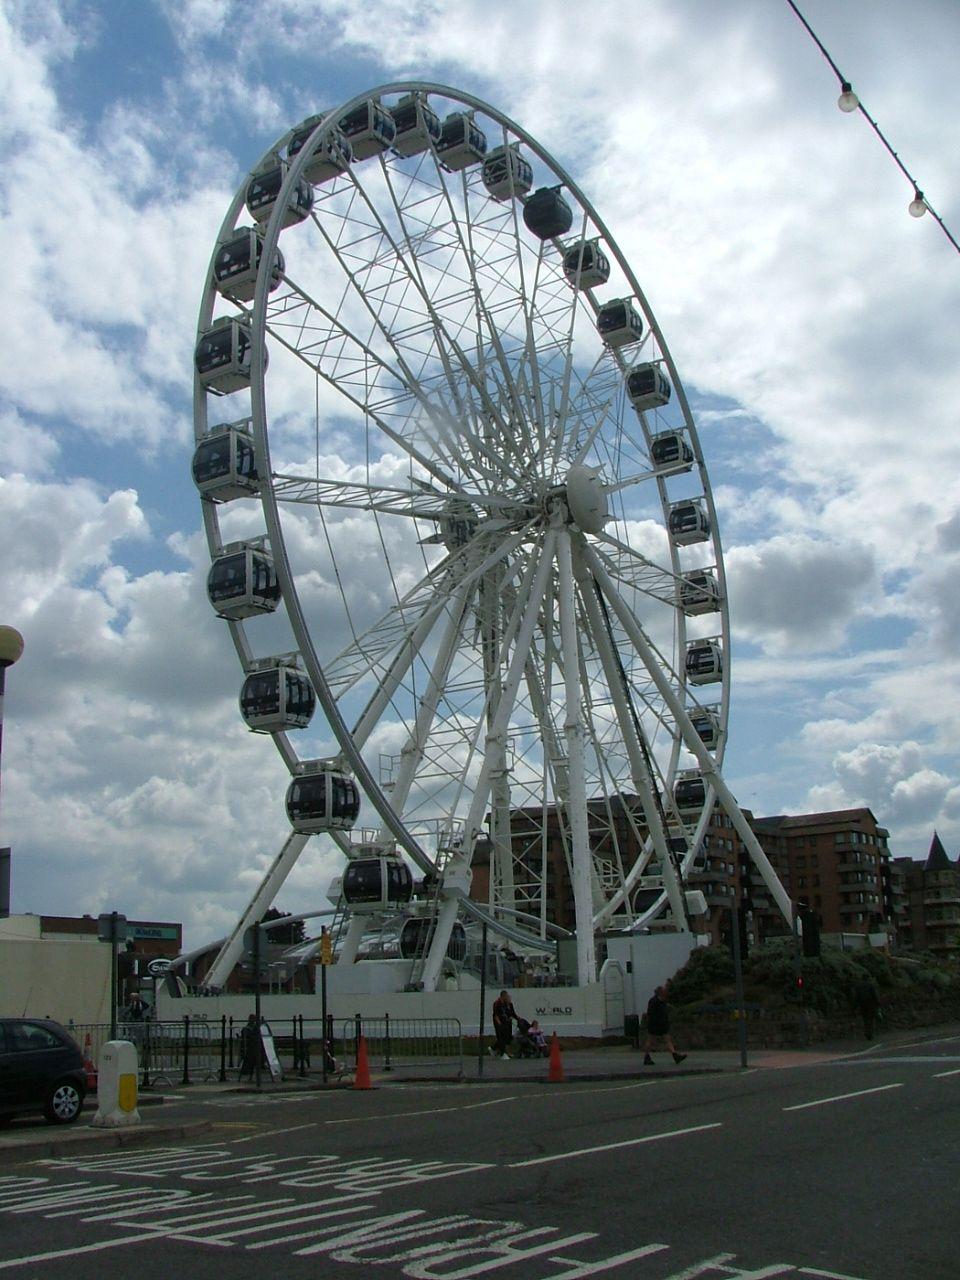 Big Wheel on Weston Super Mare promenade.